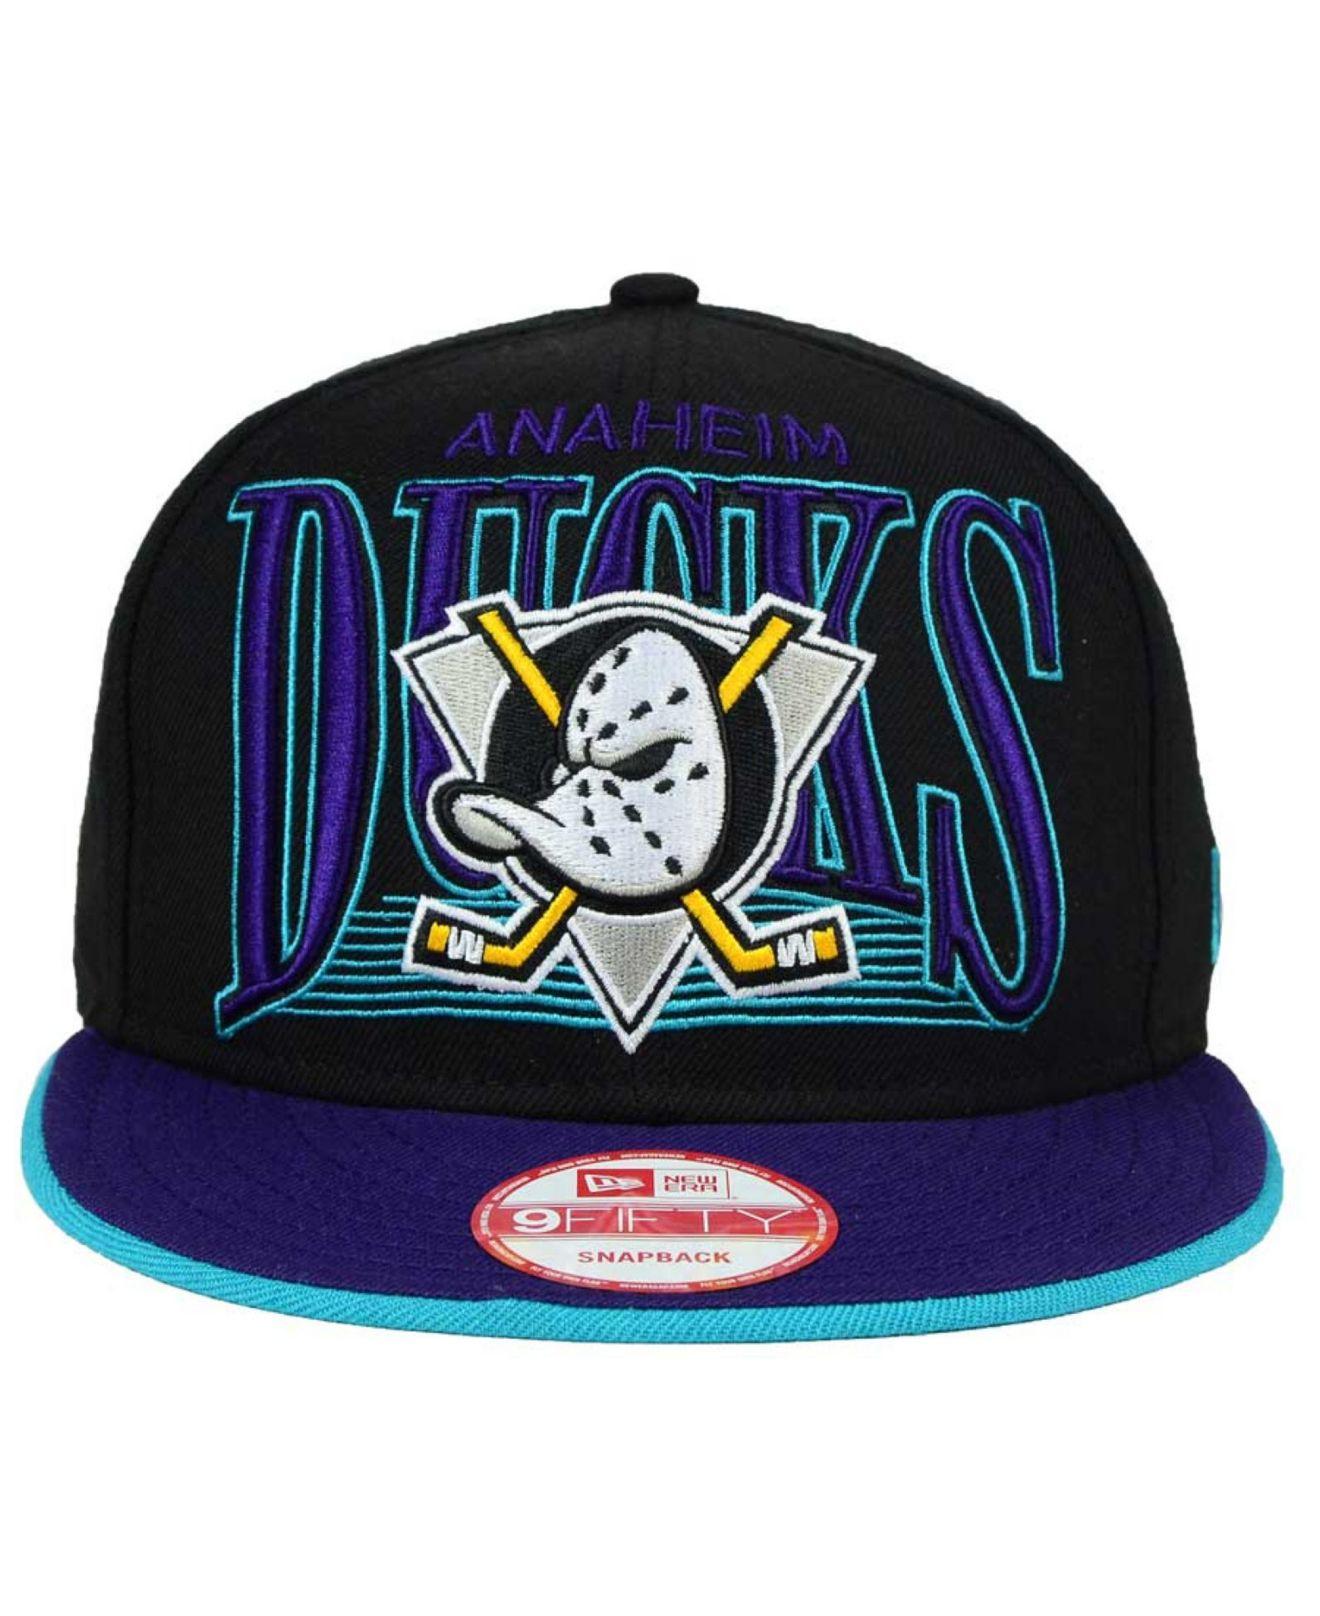 huge discount 3fed7 94da0 Lyst - KTZ Anaheim Ducks Ice Block 9fifty Snapback Cap in Blue for Men